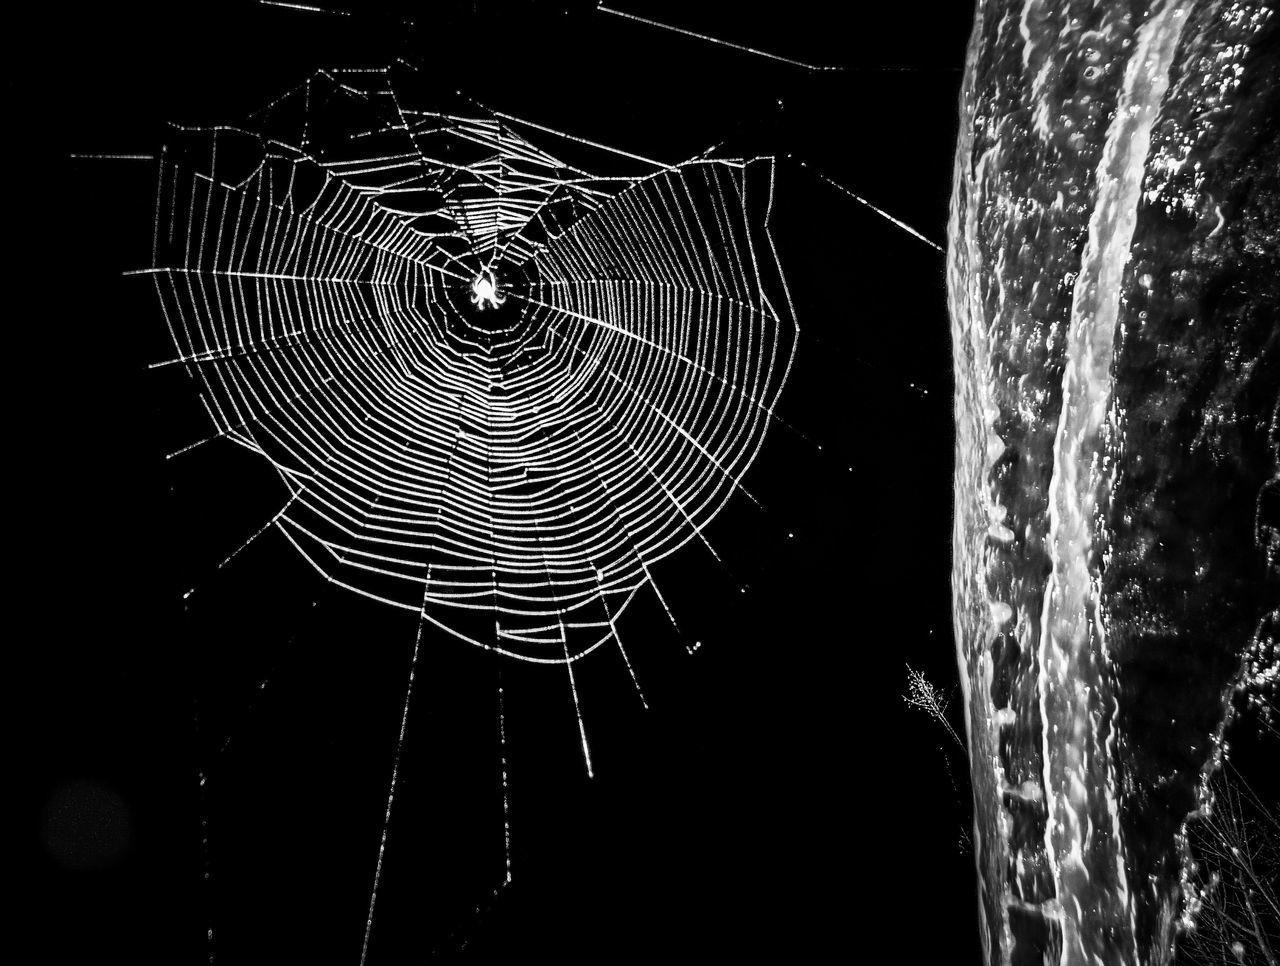 CLOSE-UP OF SPIDER WEB OVER BLACK BACKGROUND